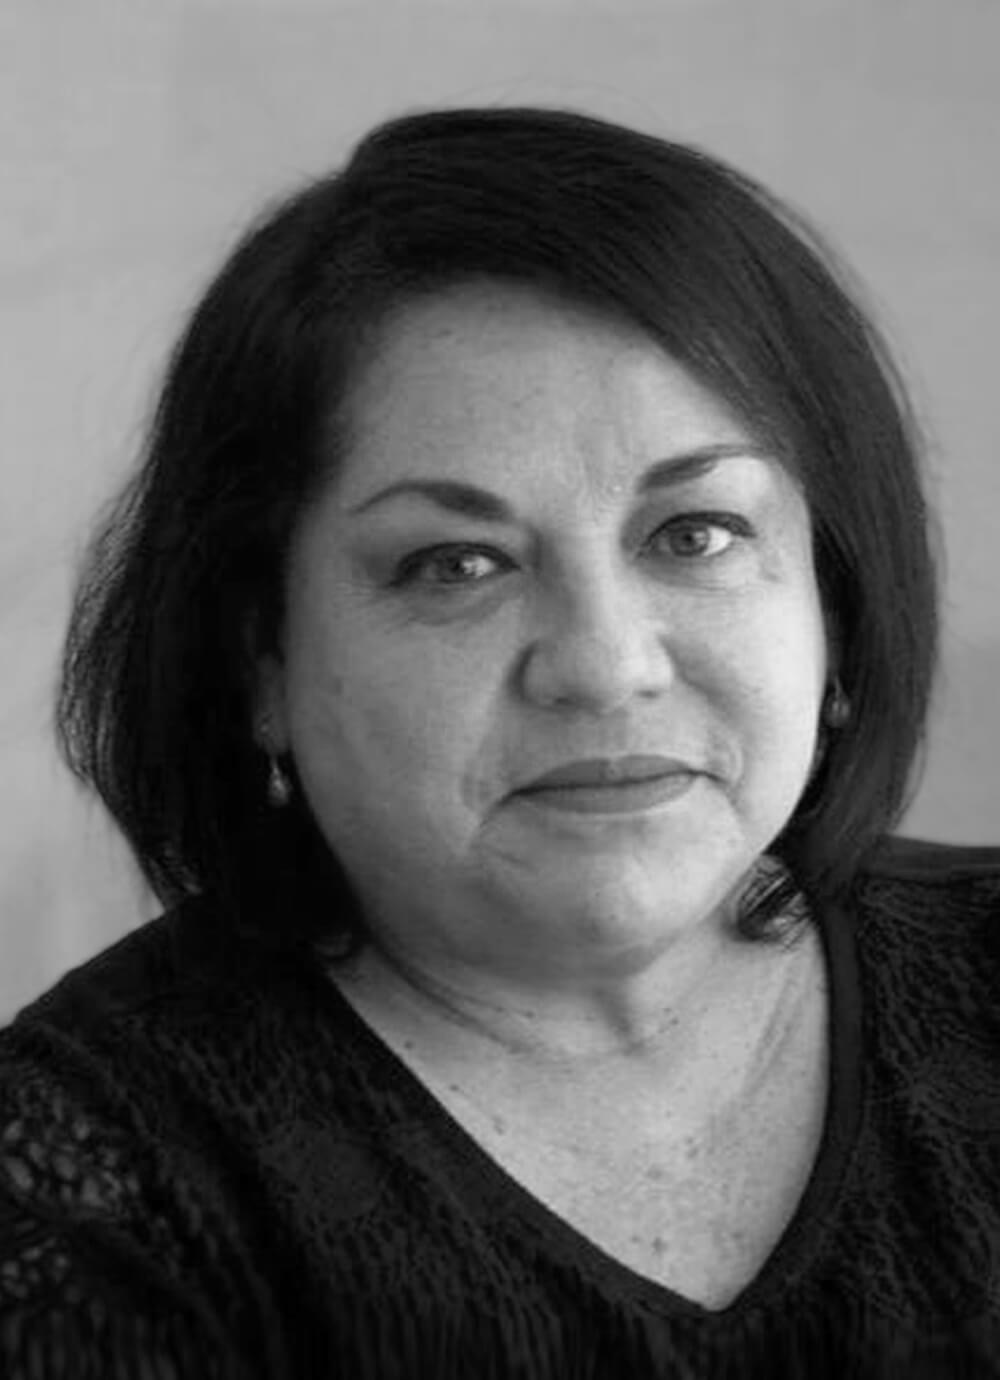 Leticia Gómez